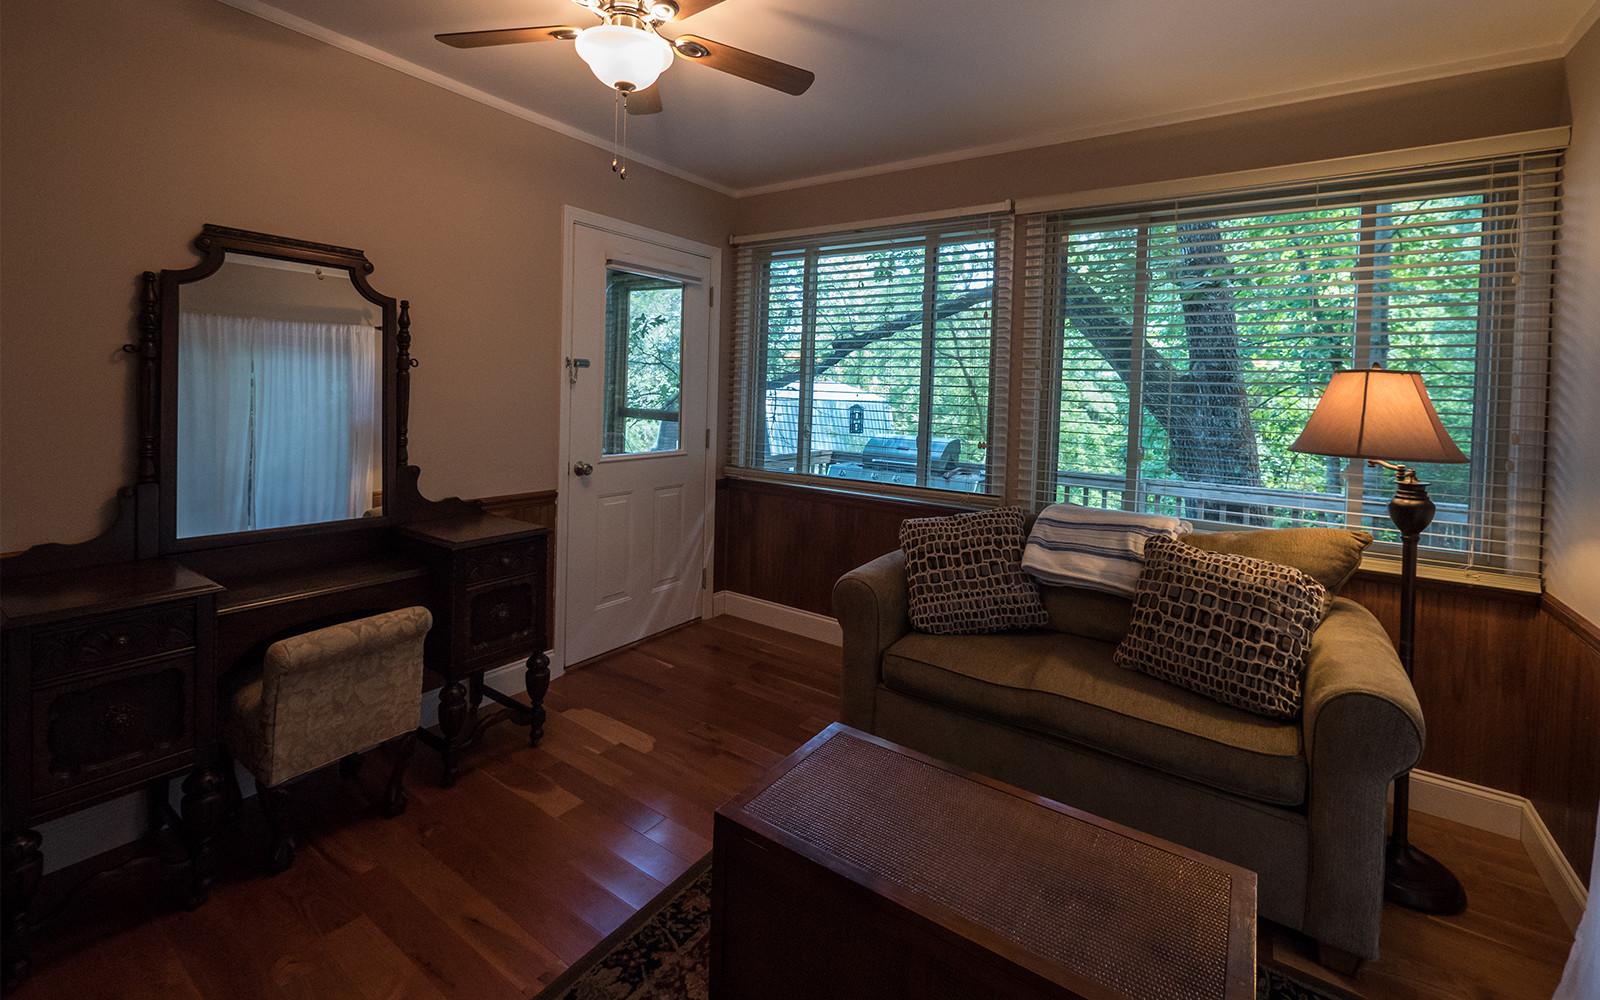 Sunporch Master Bedroom Hilt St house